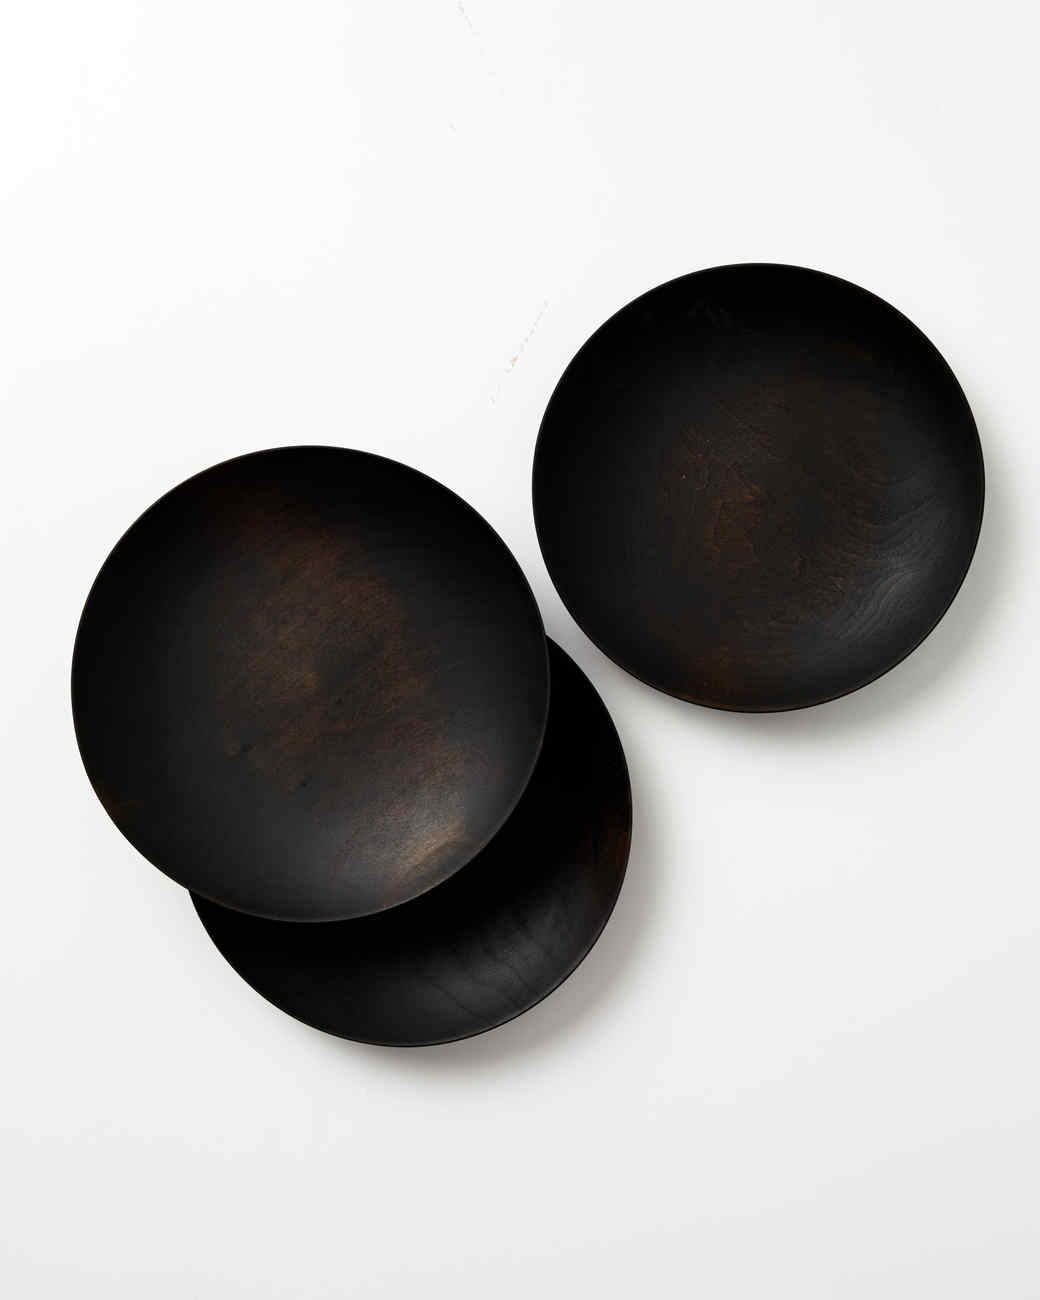 blackcreek-bowls-203-d111535-1214.jpg